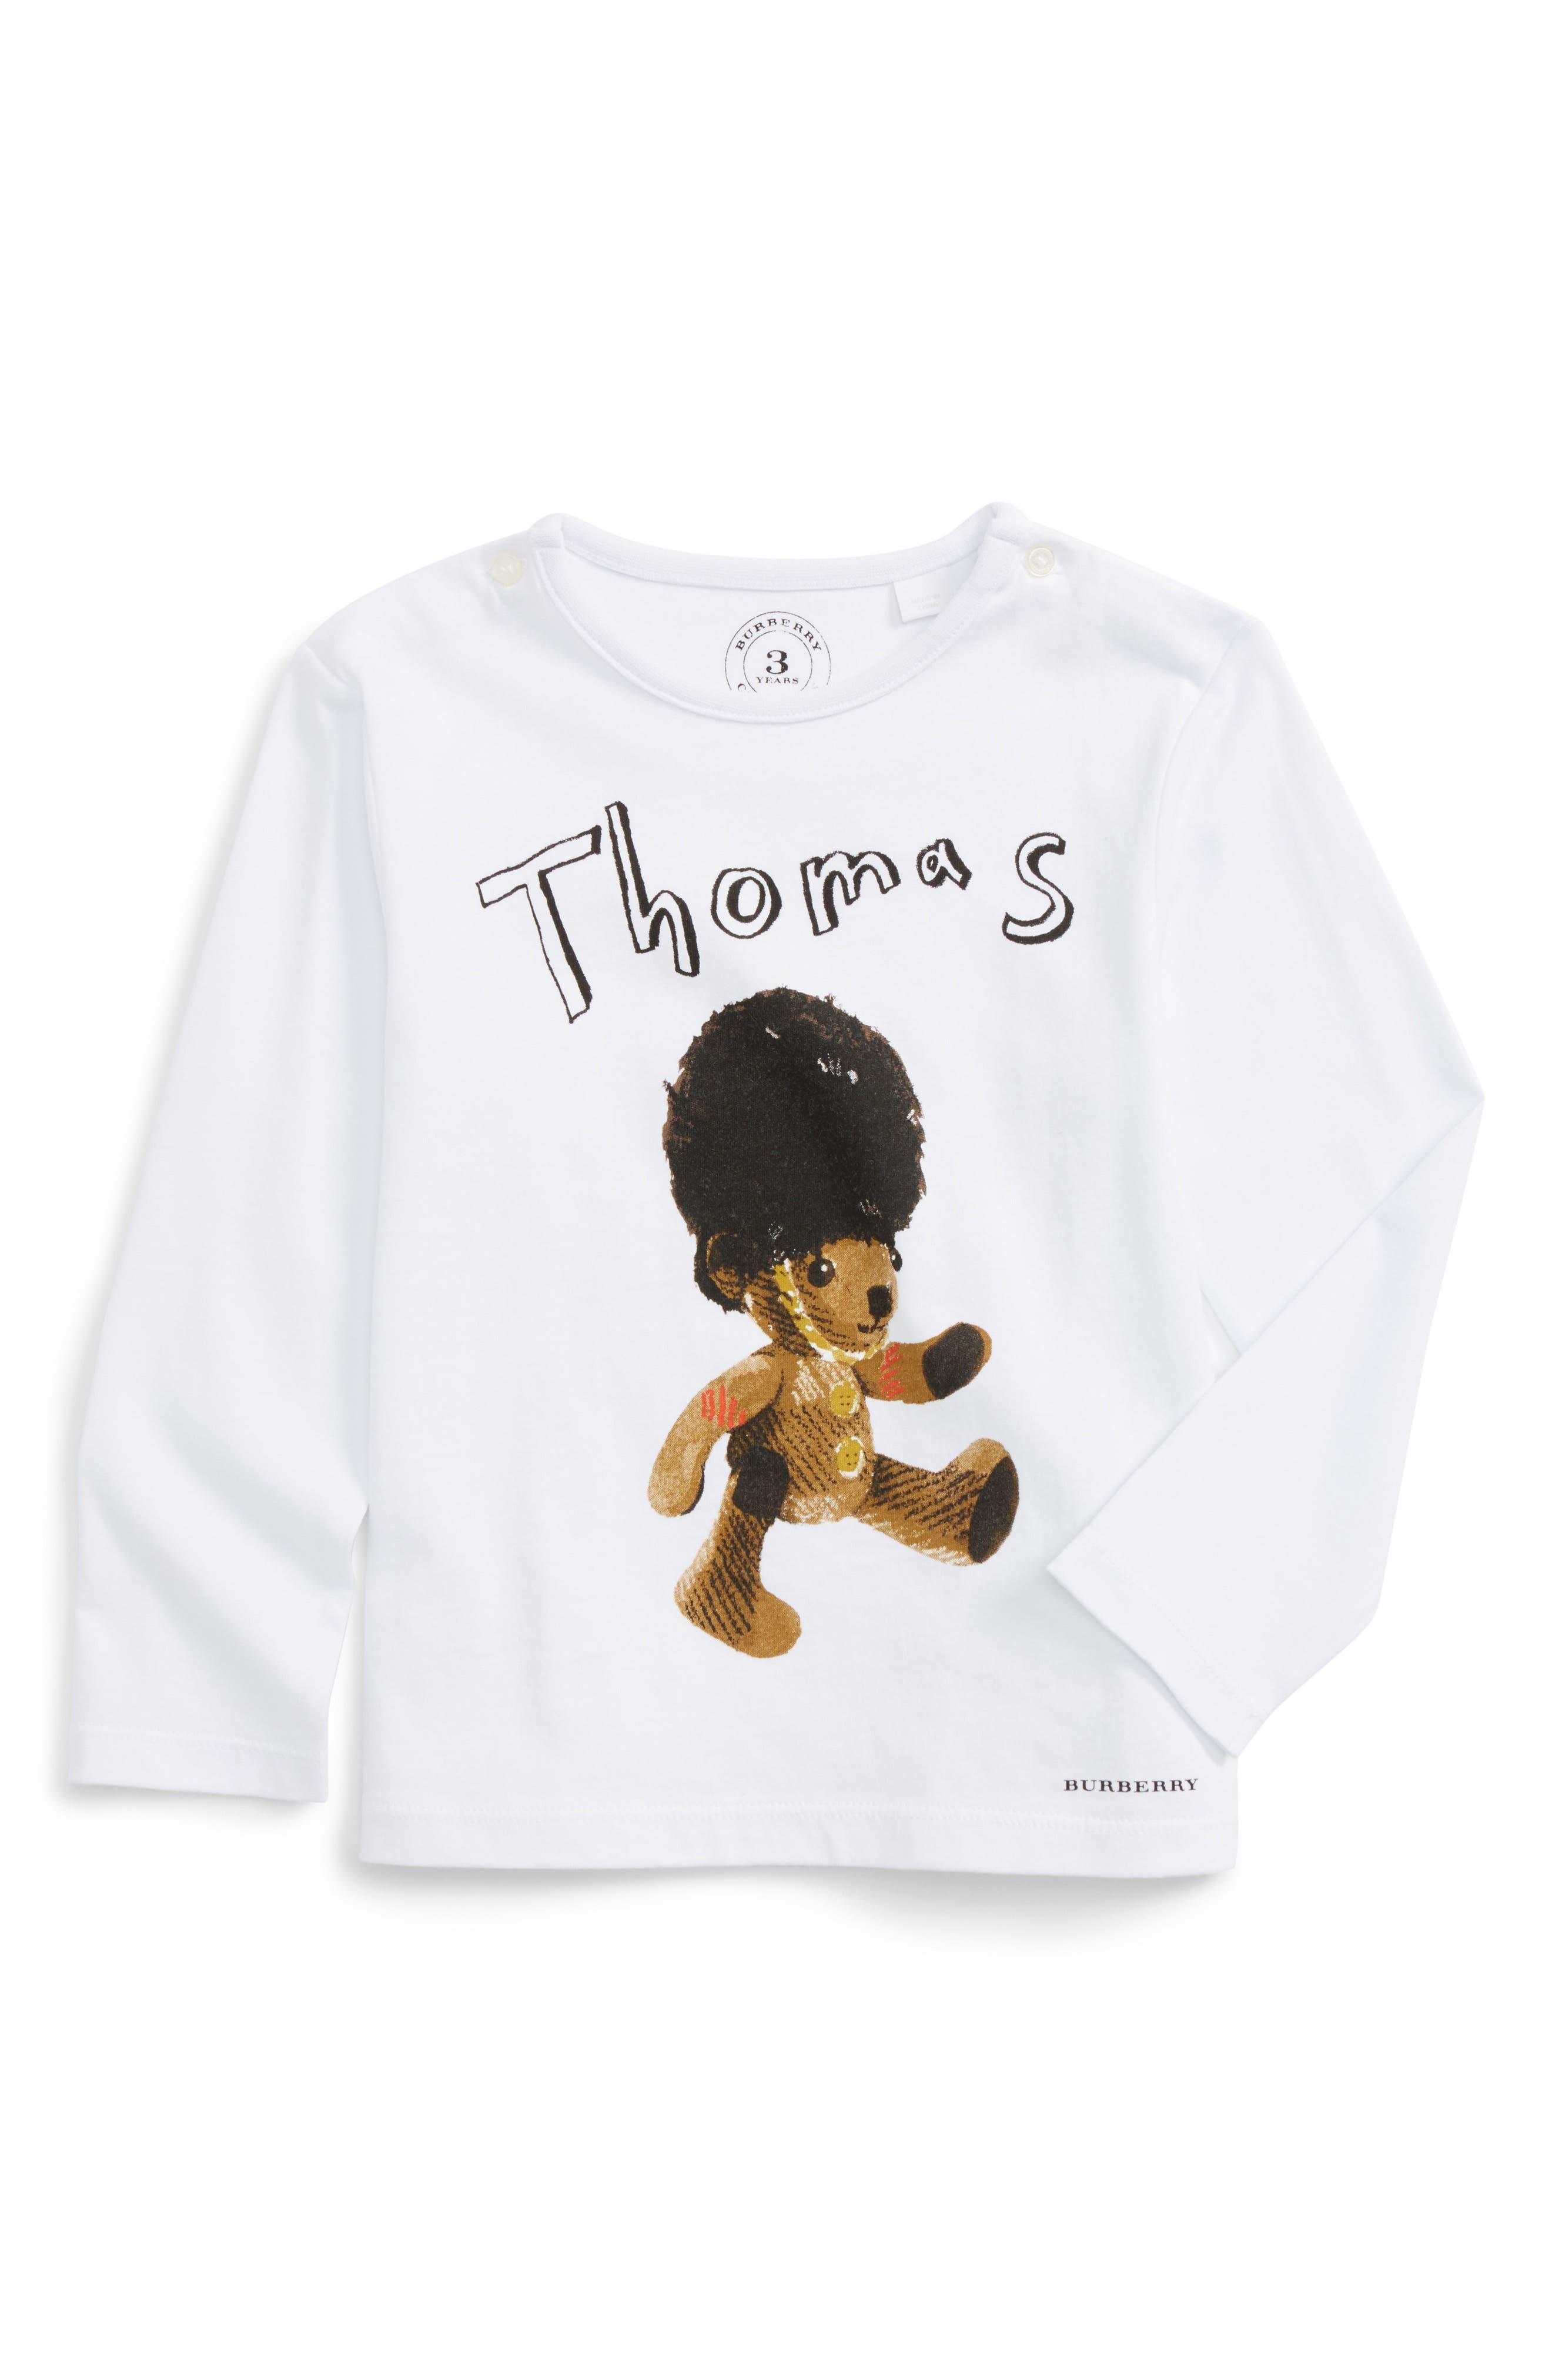 Main Image - Burberry Thomas Bear Graphic T-Shirt (Toddler Boys)